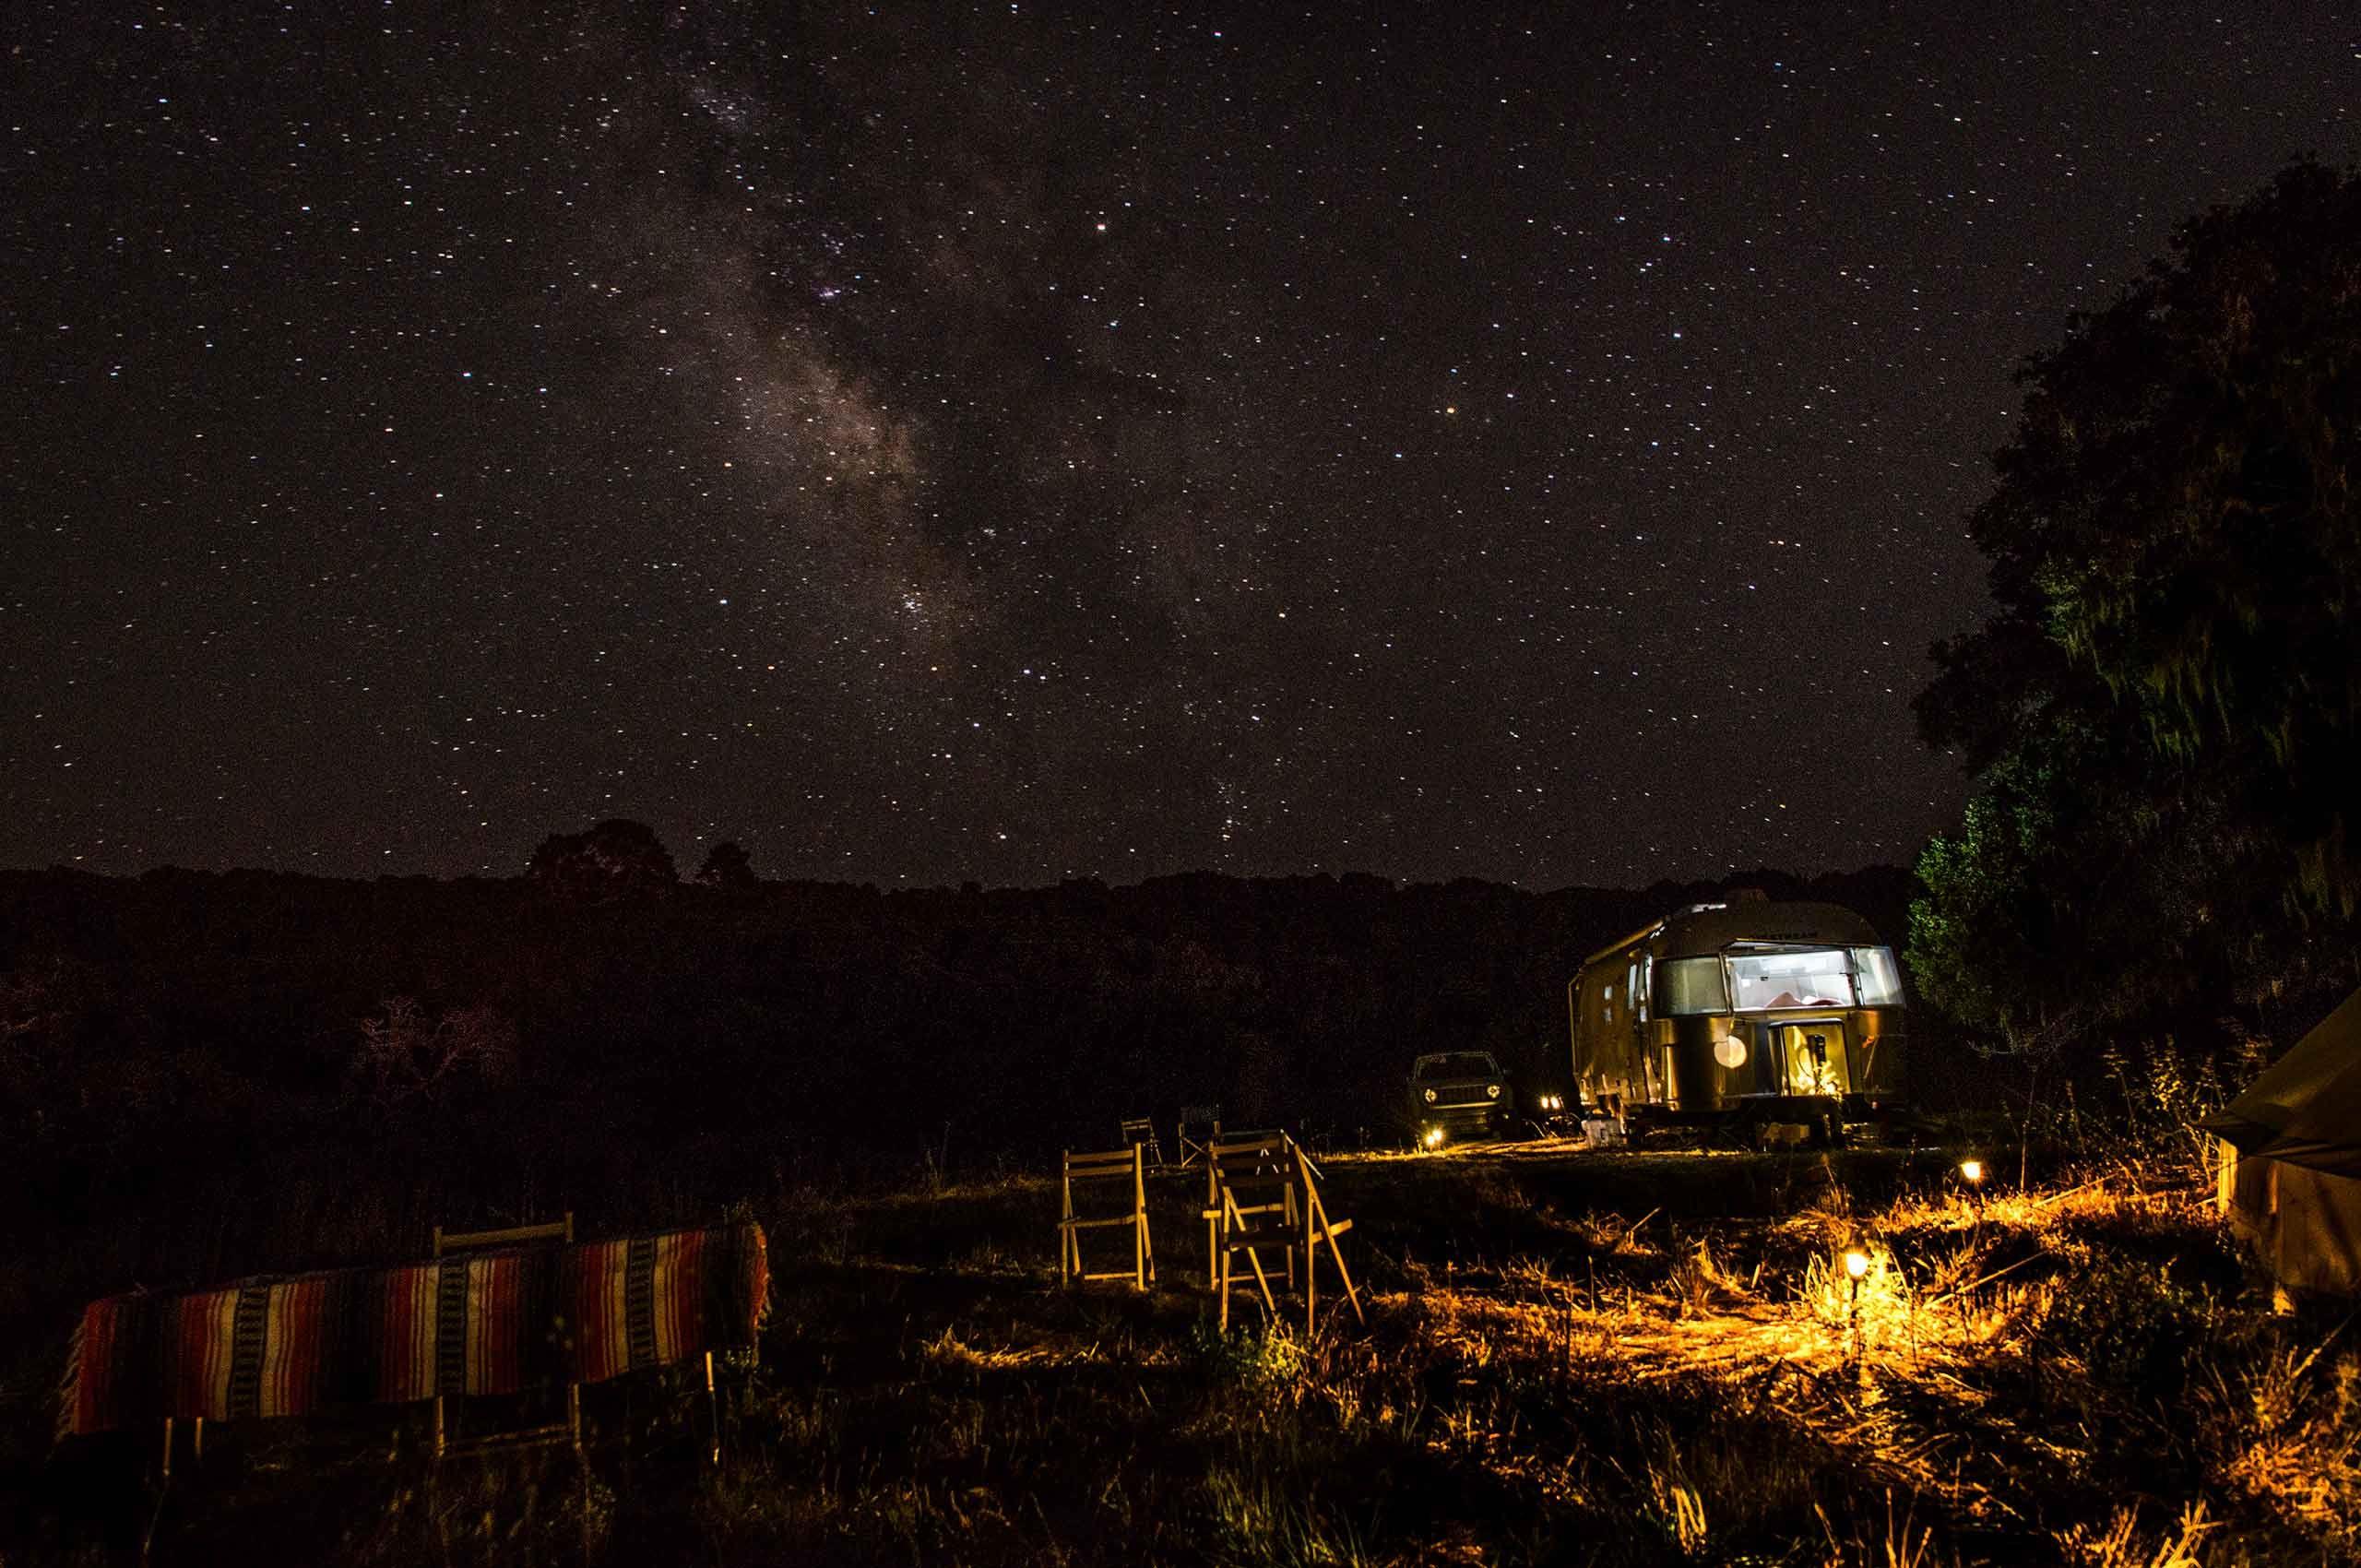 Walden-Monterey-Airstream-starryskies-by-HenrikOlundPhotography.jpg